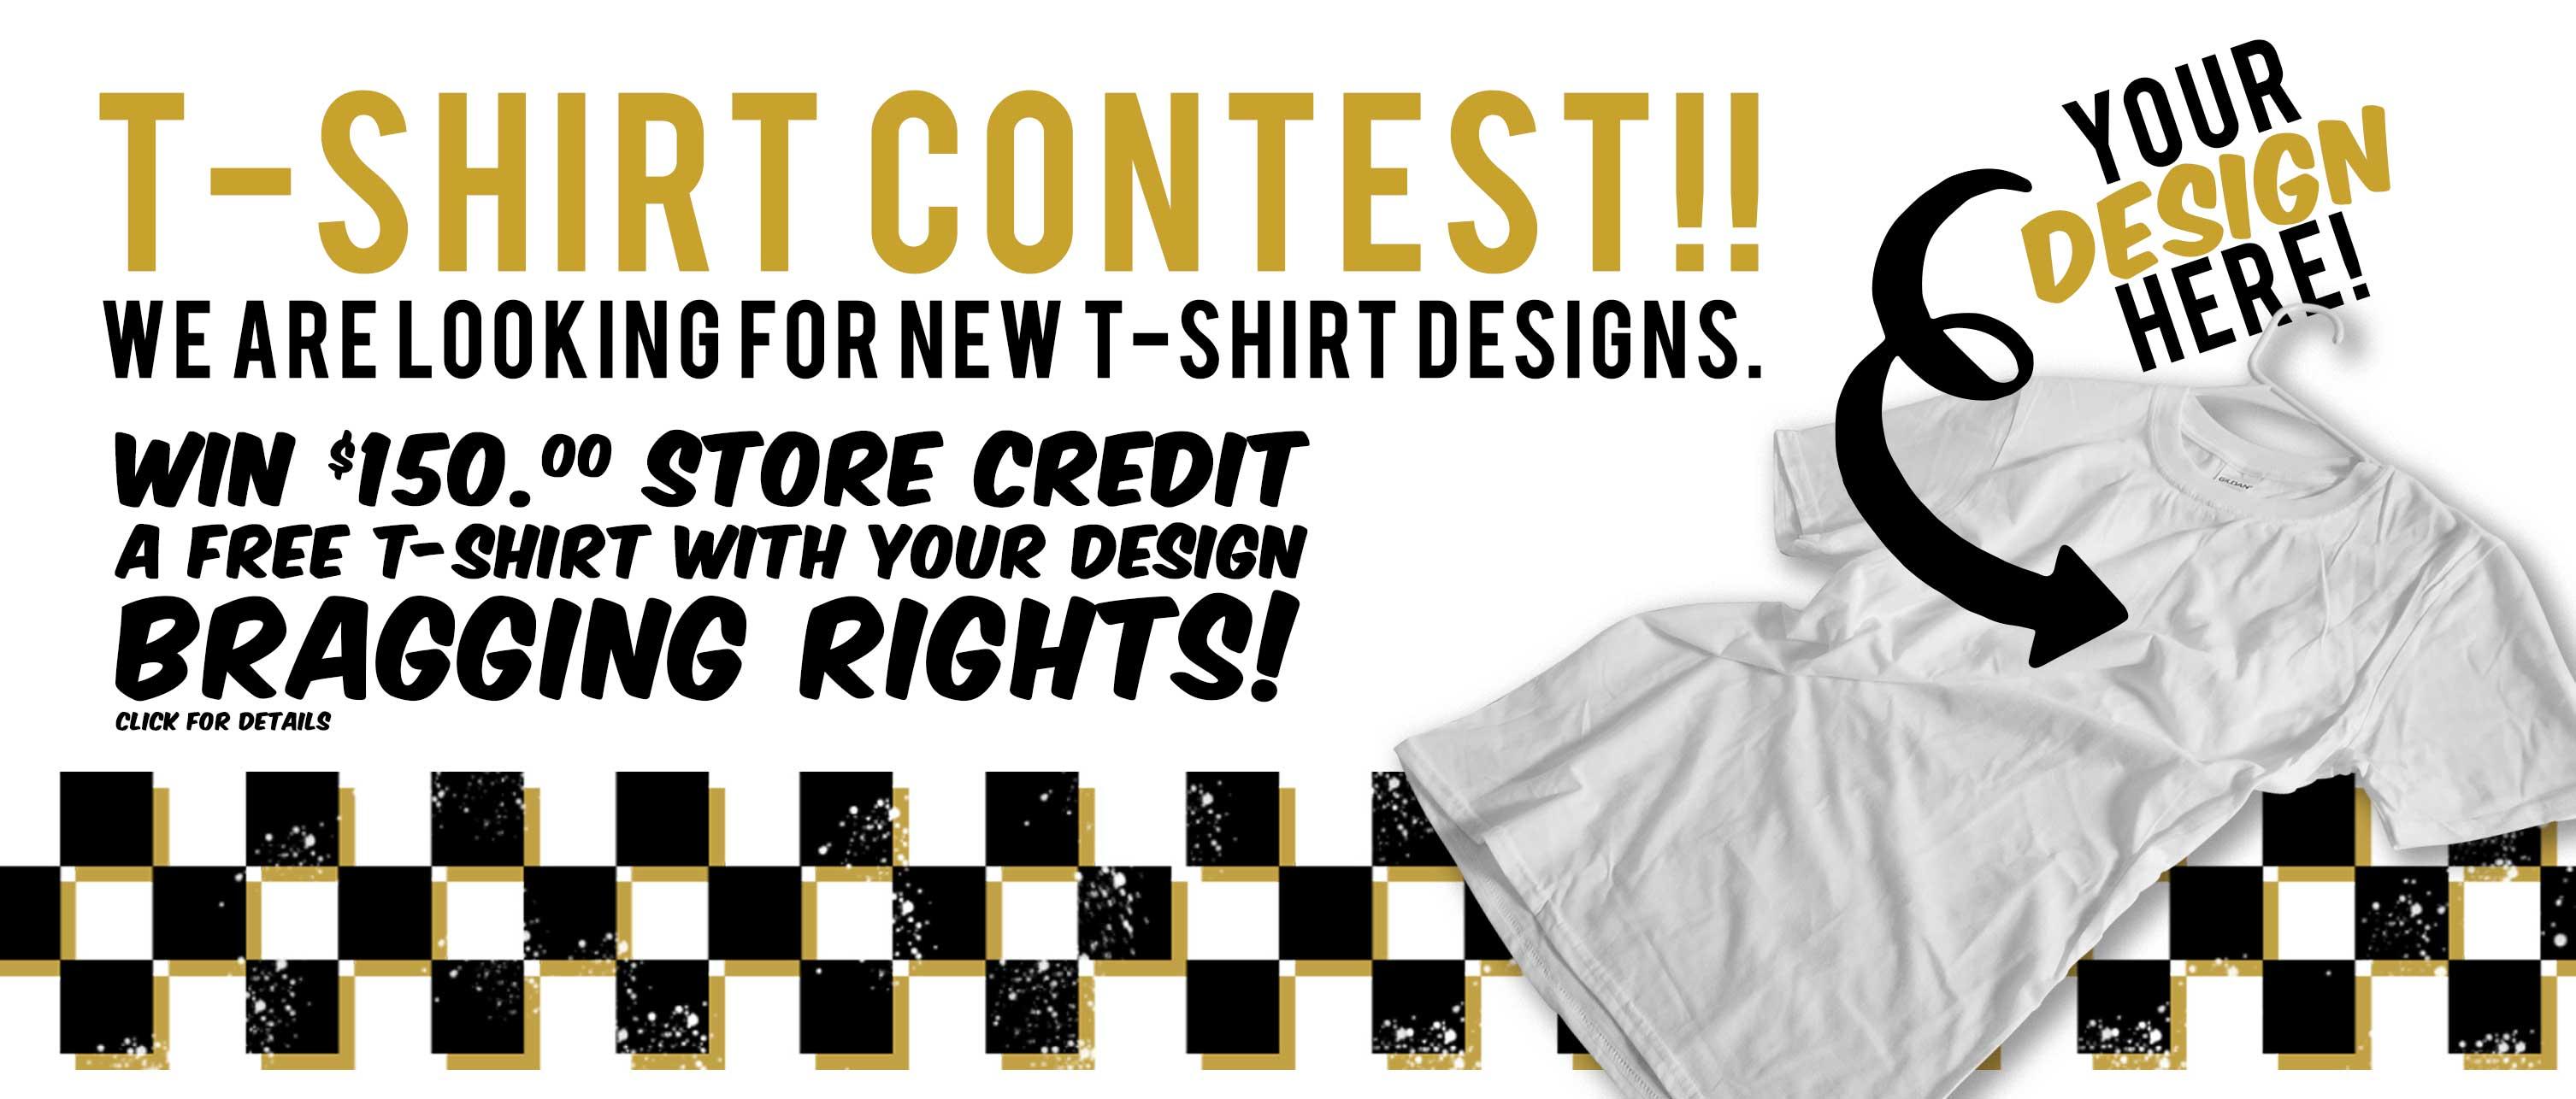 t-shirt-contest.jpg